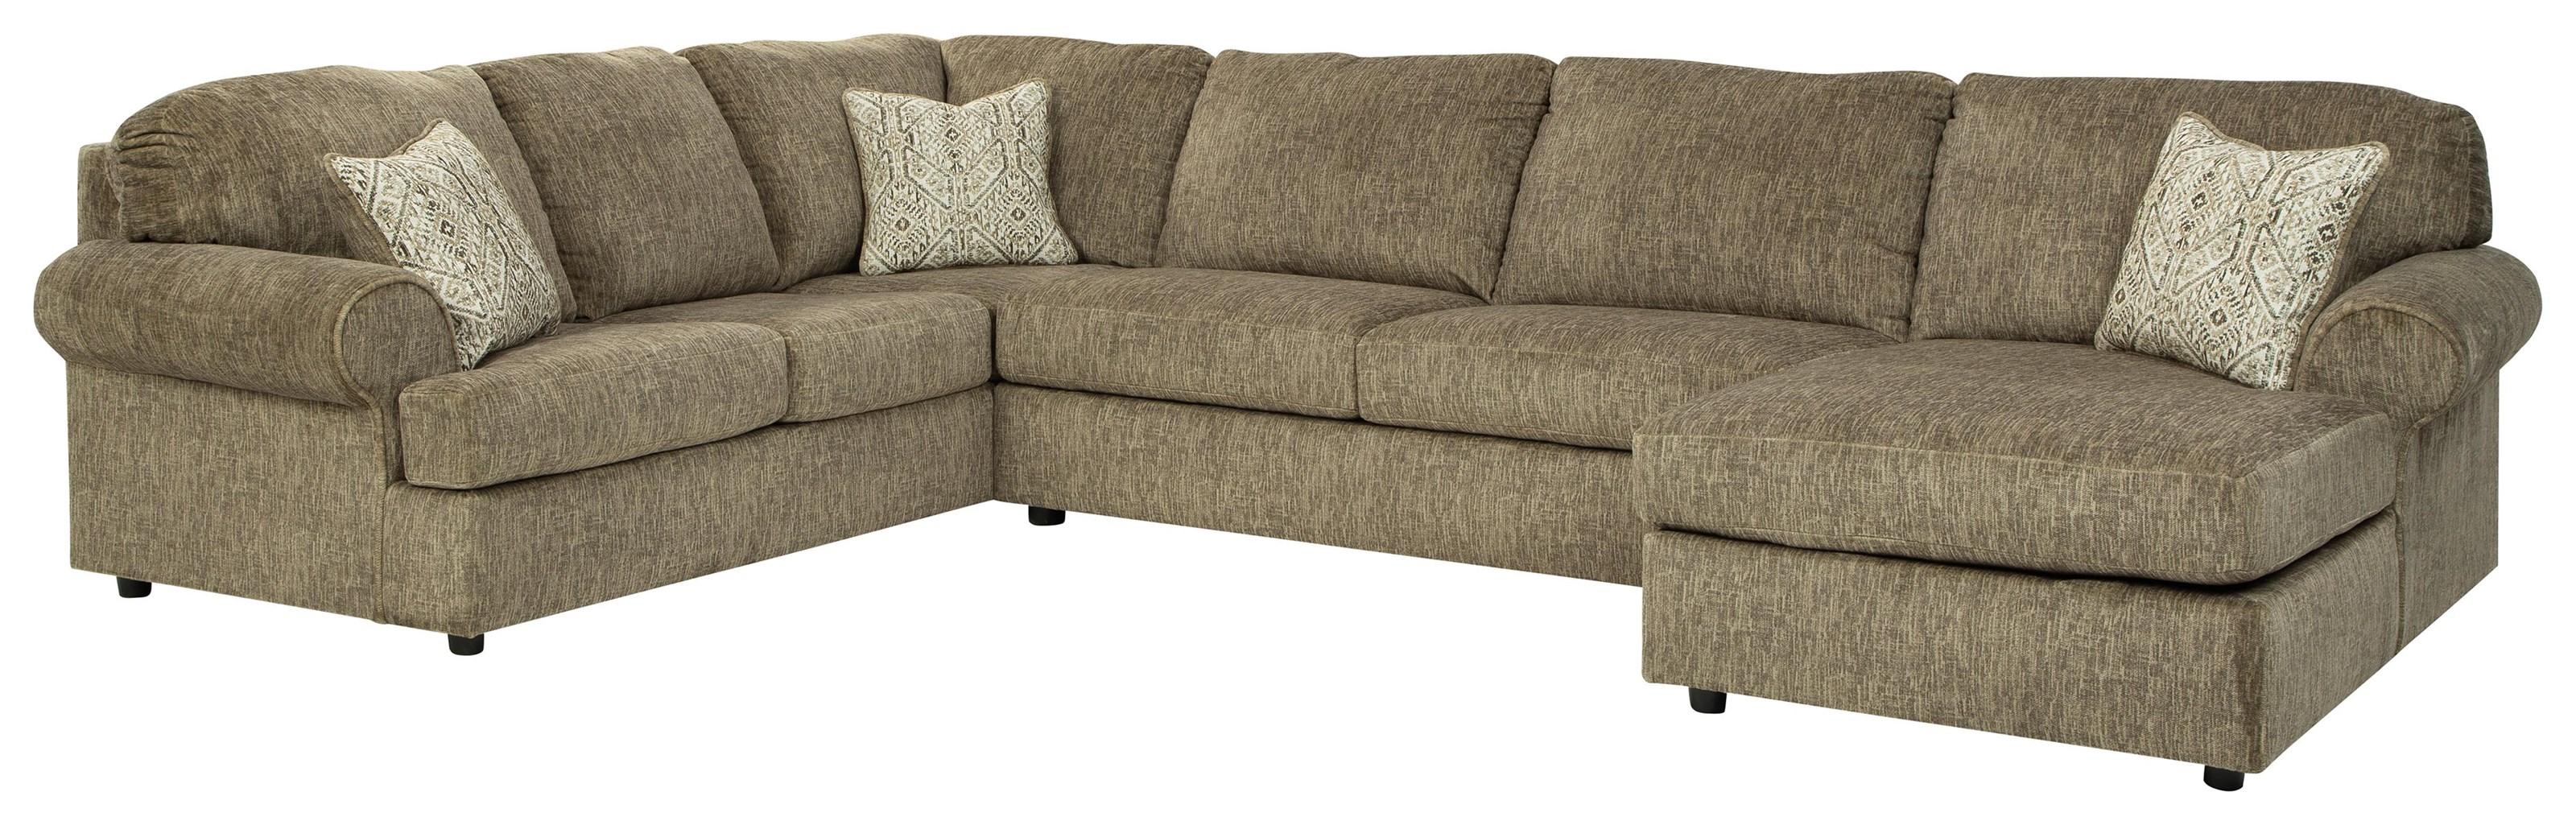 Hoylake 3 PIECE LAF SECTIONAL by Ashley Furniture at Johnny Janosik